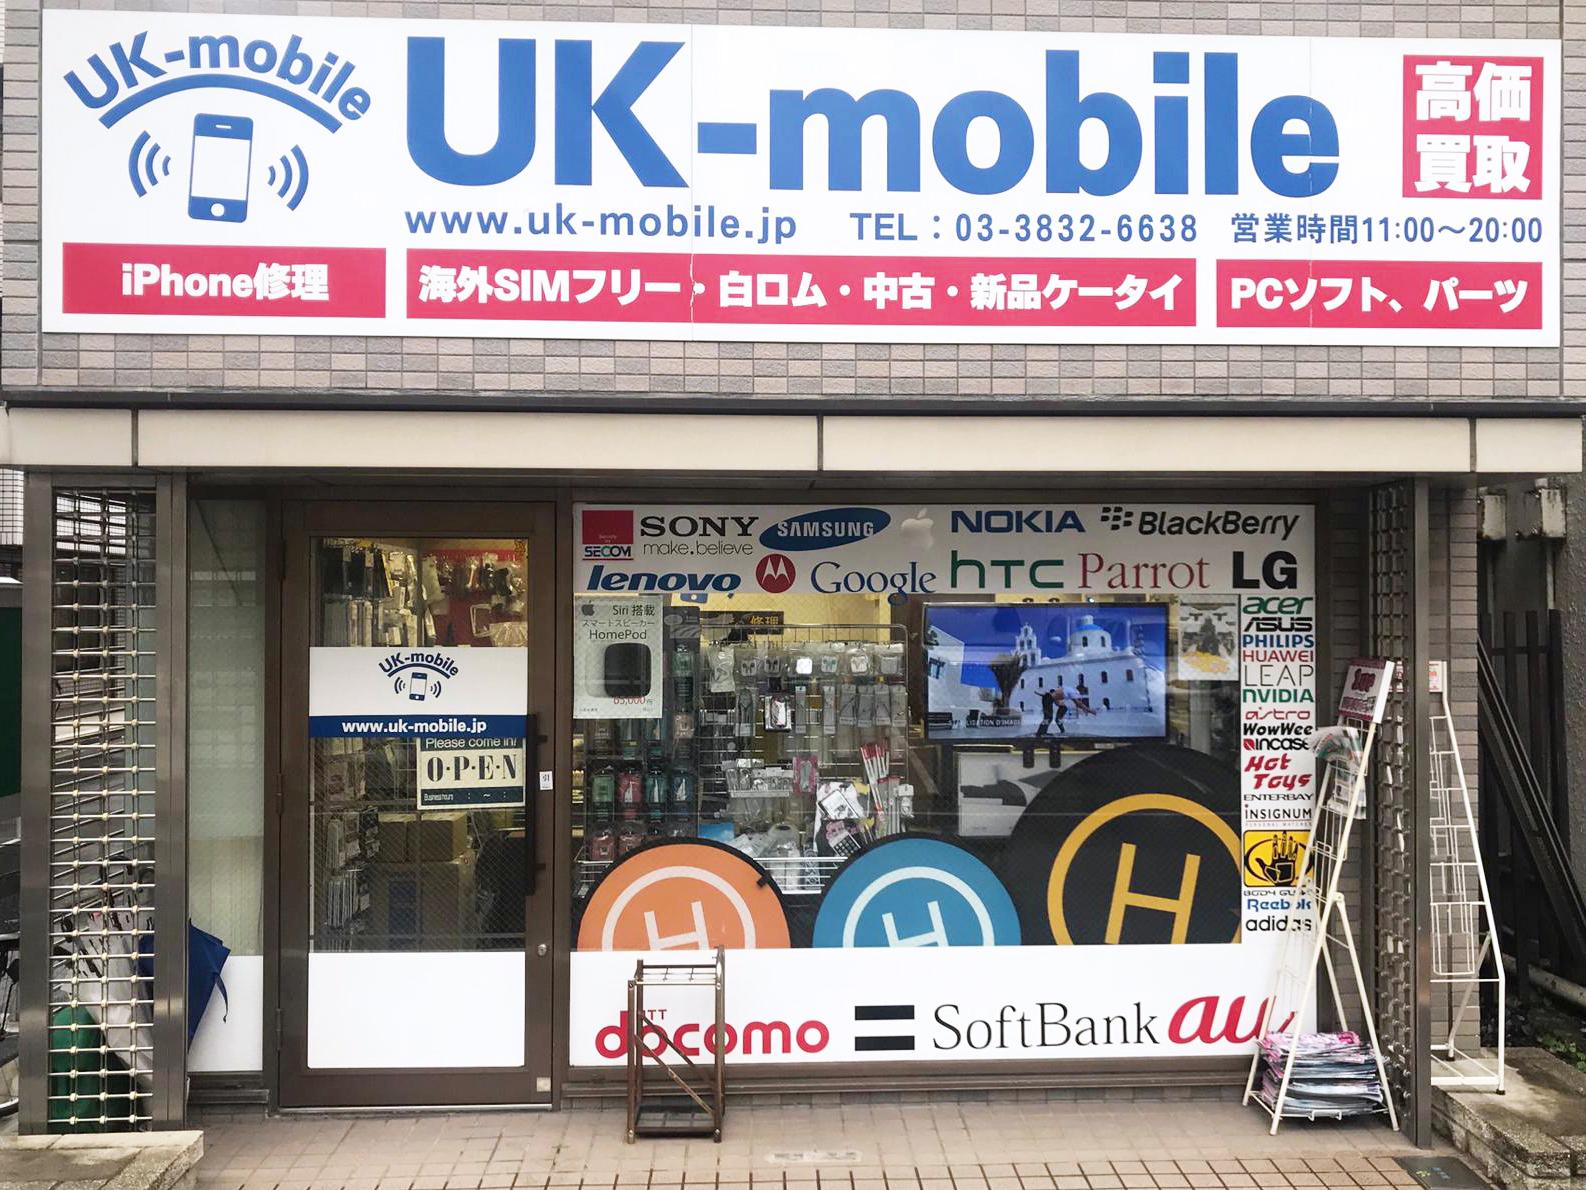 UK-mobile